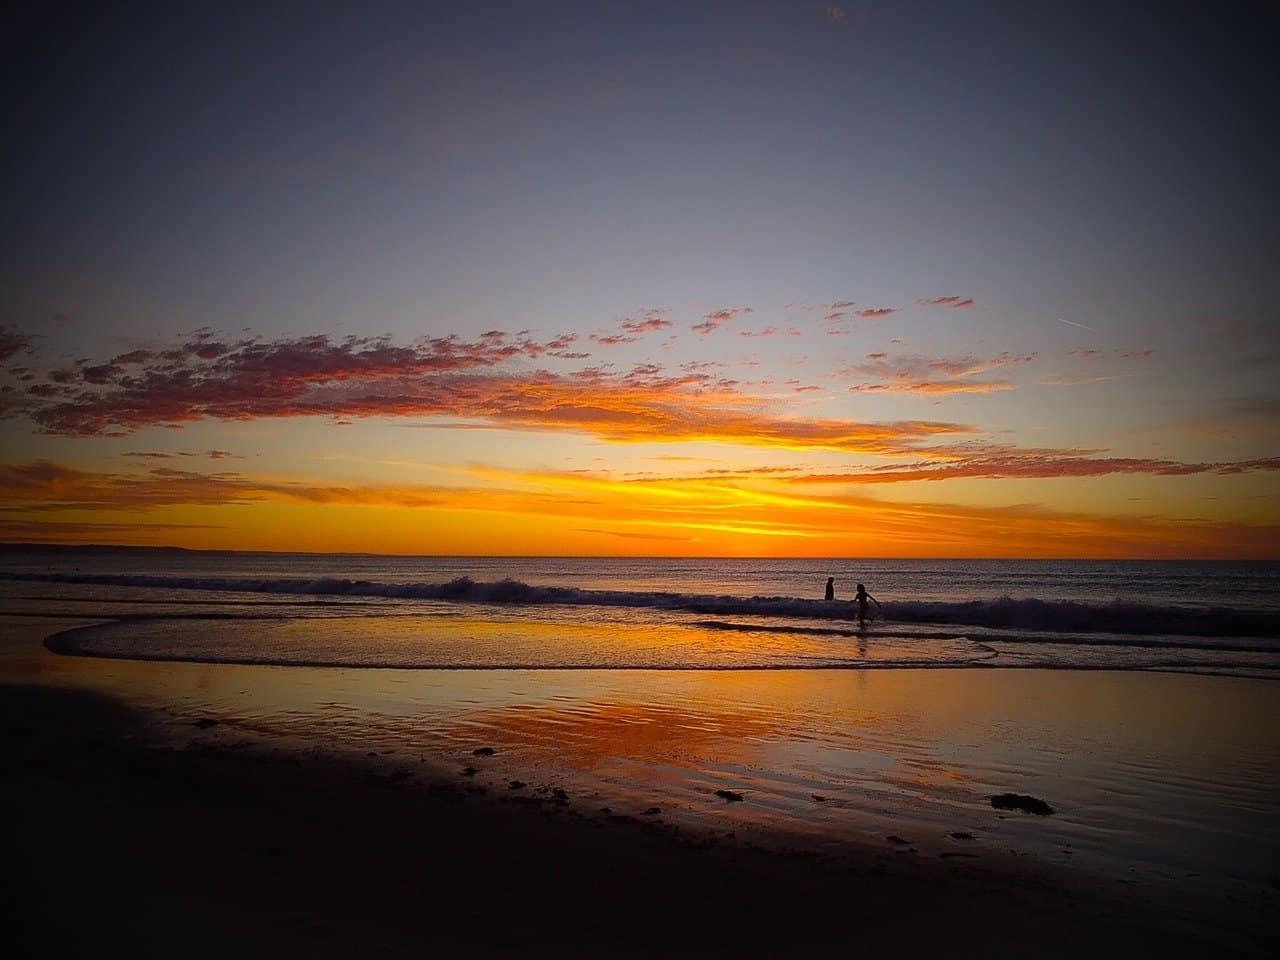 Moana Beach, Adelaide, Australia